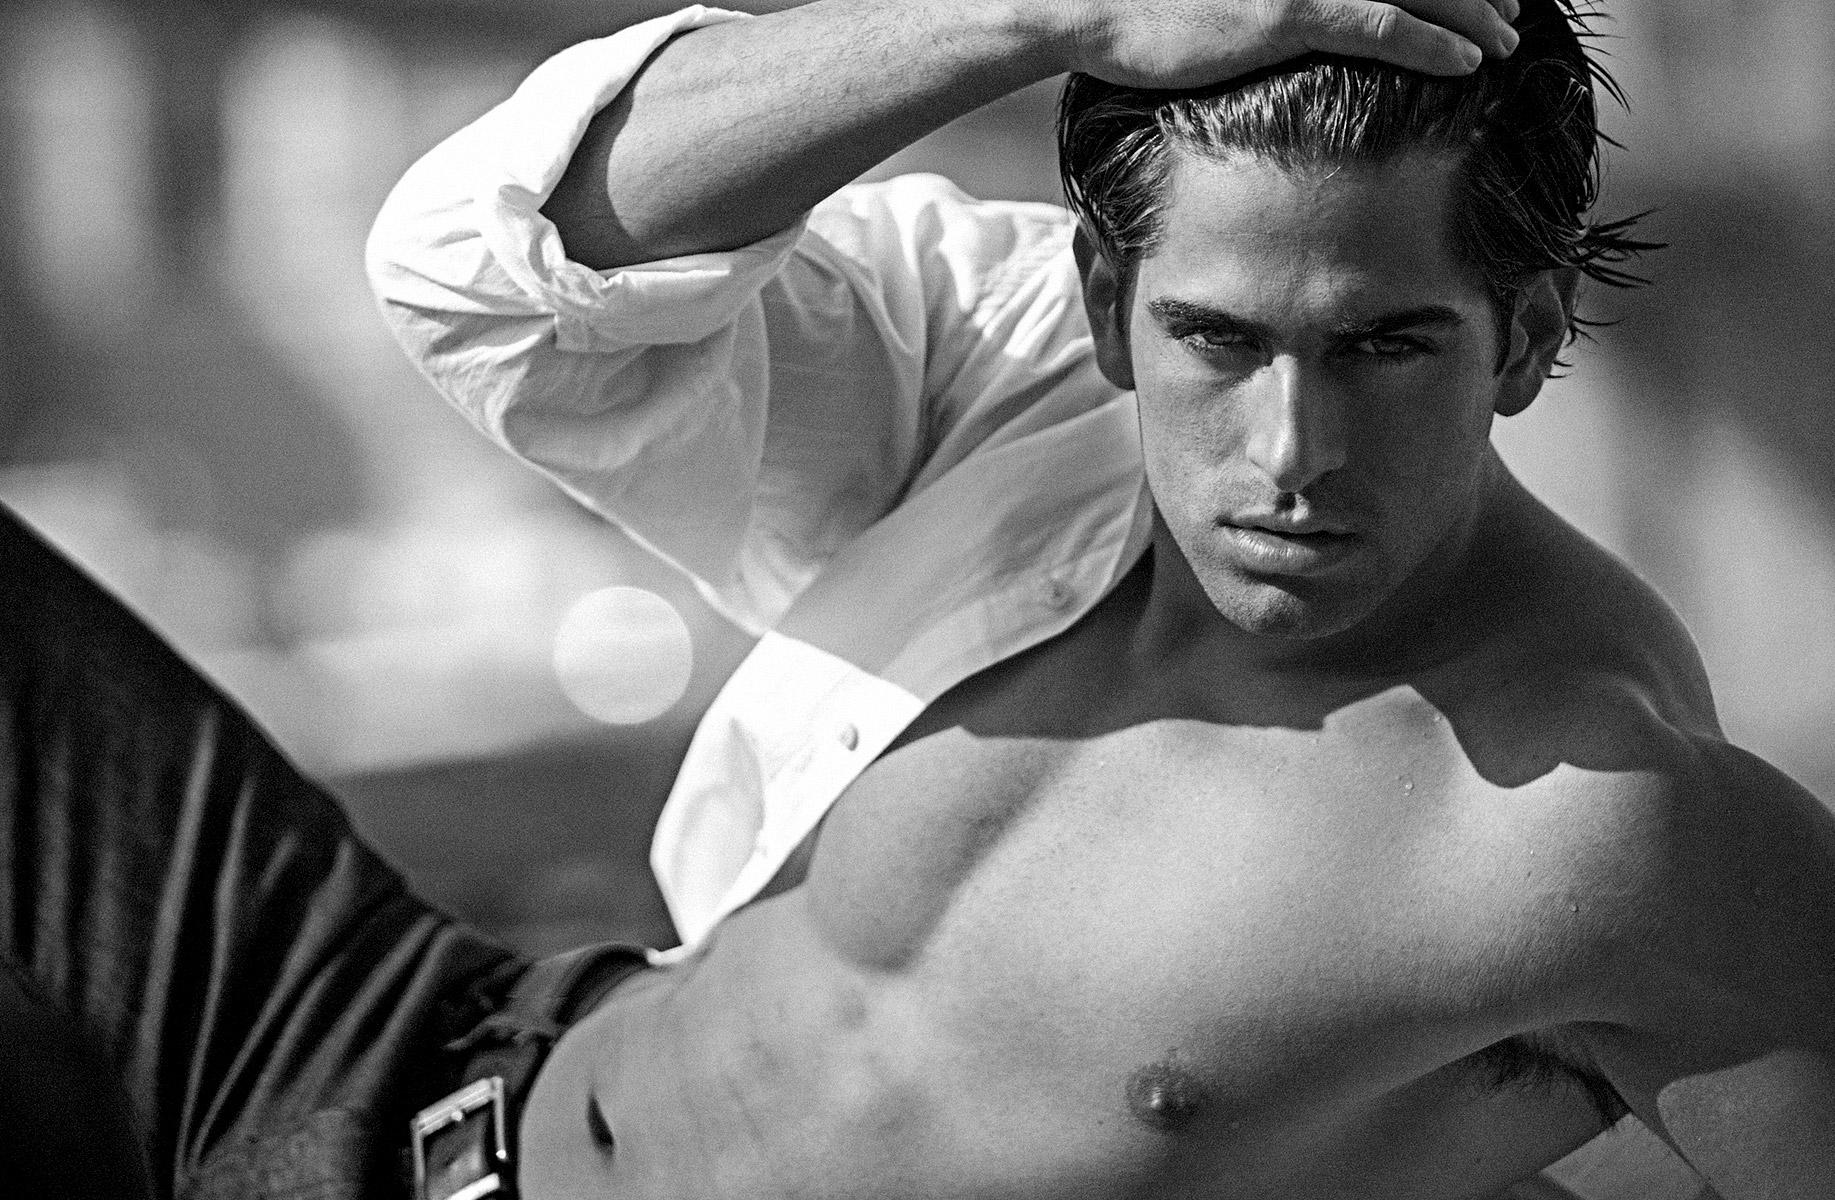 new-mexico-albuquerque-male-models-men-28.jpg